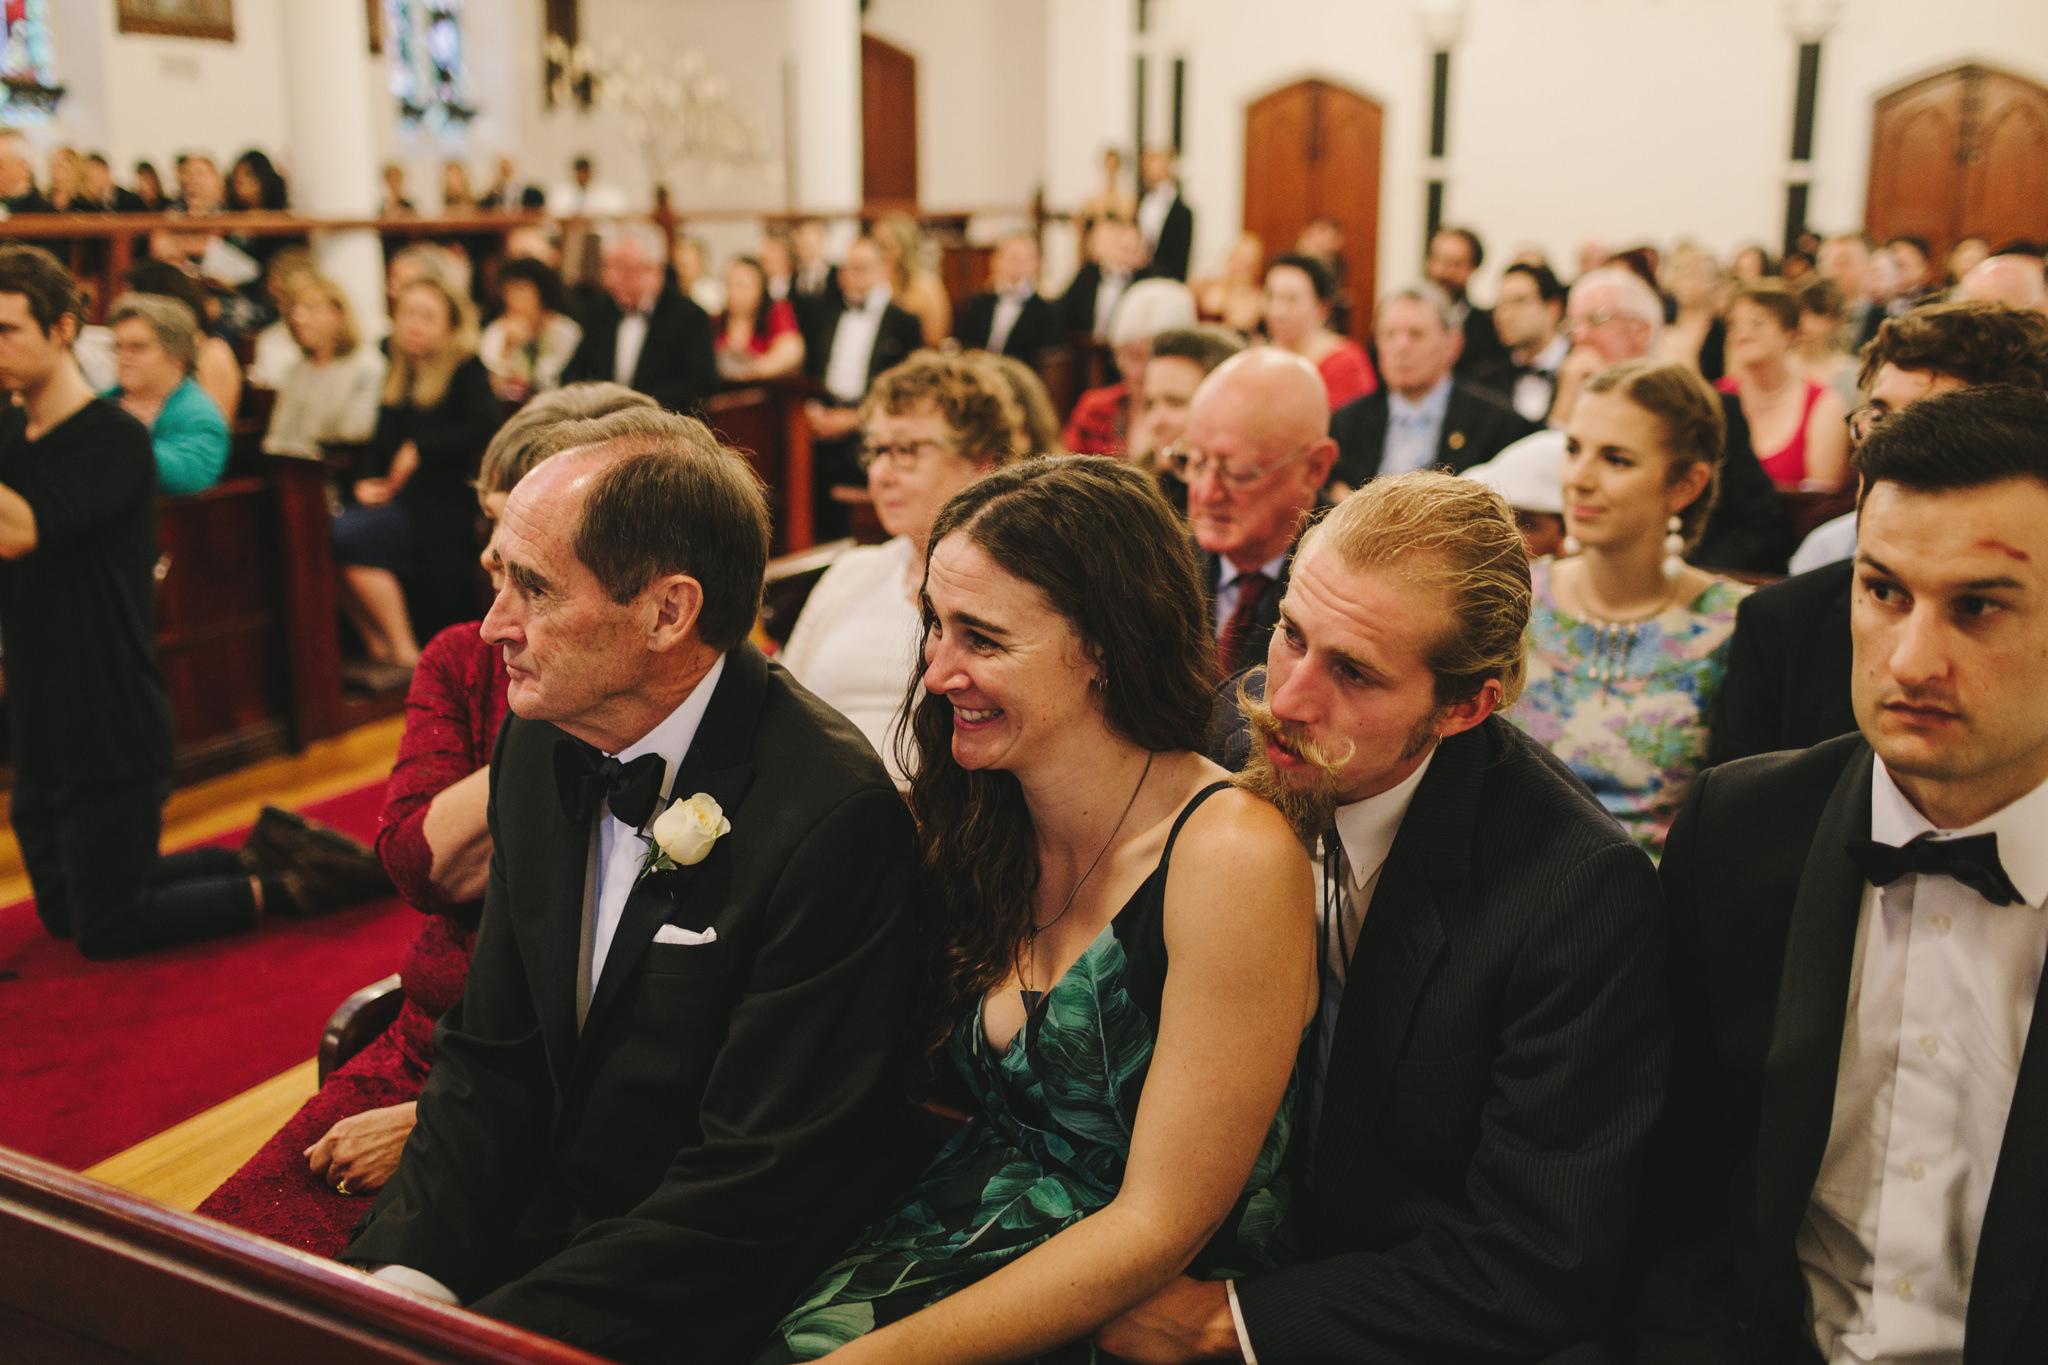 Abbotsford_Convent_Wedding_Peter_Anna061.JPG